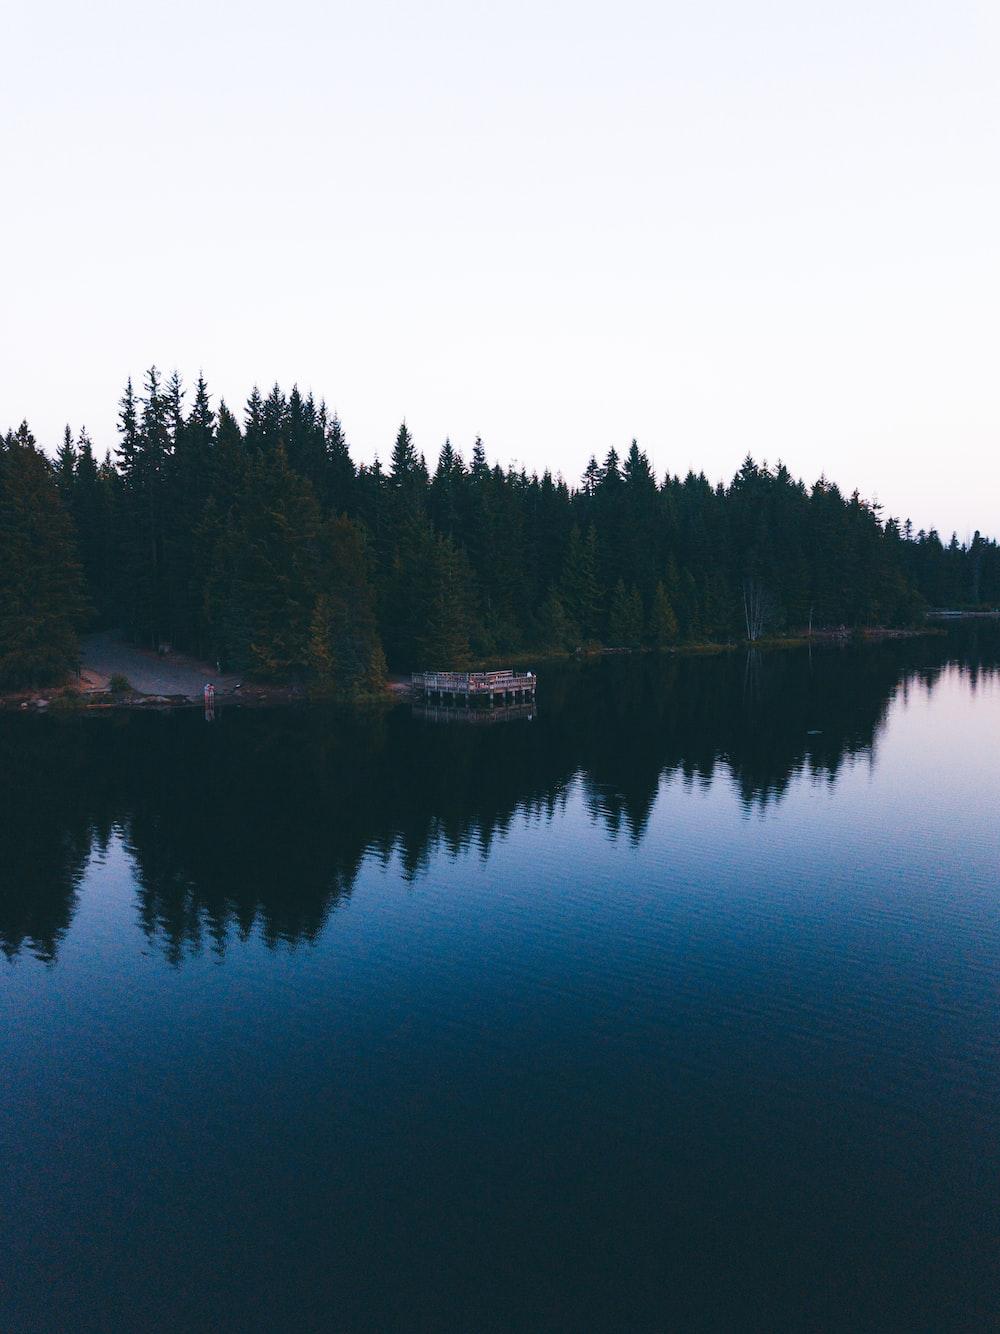 green trees beside lake under gray sky